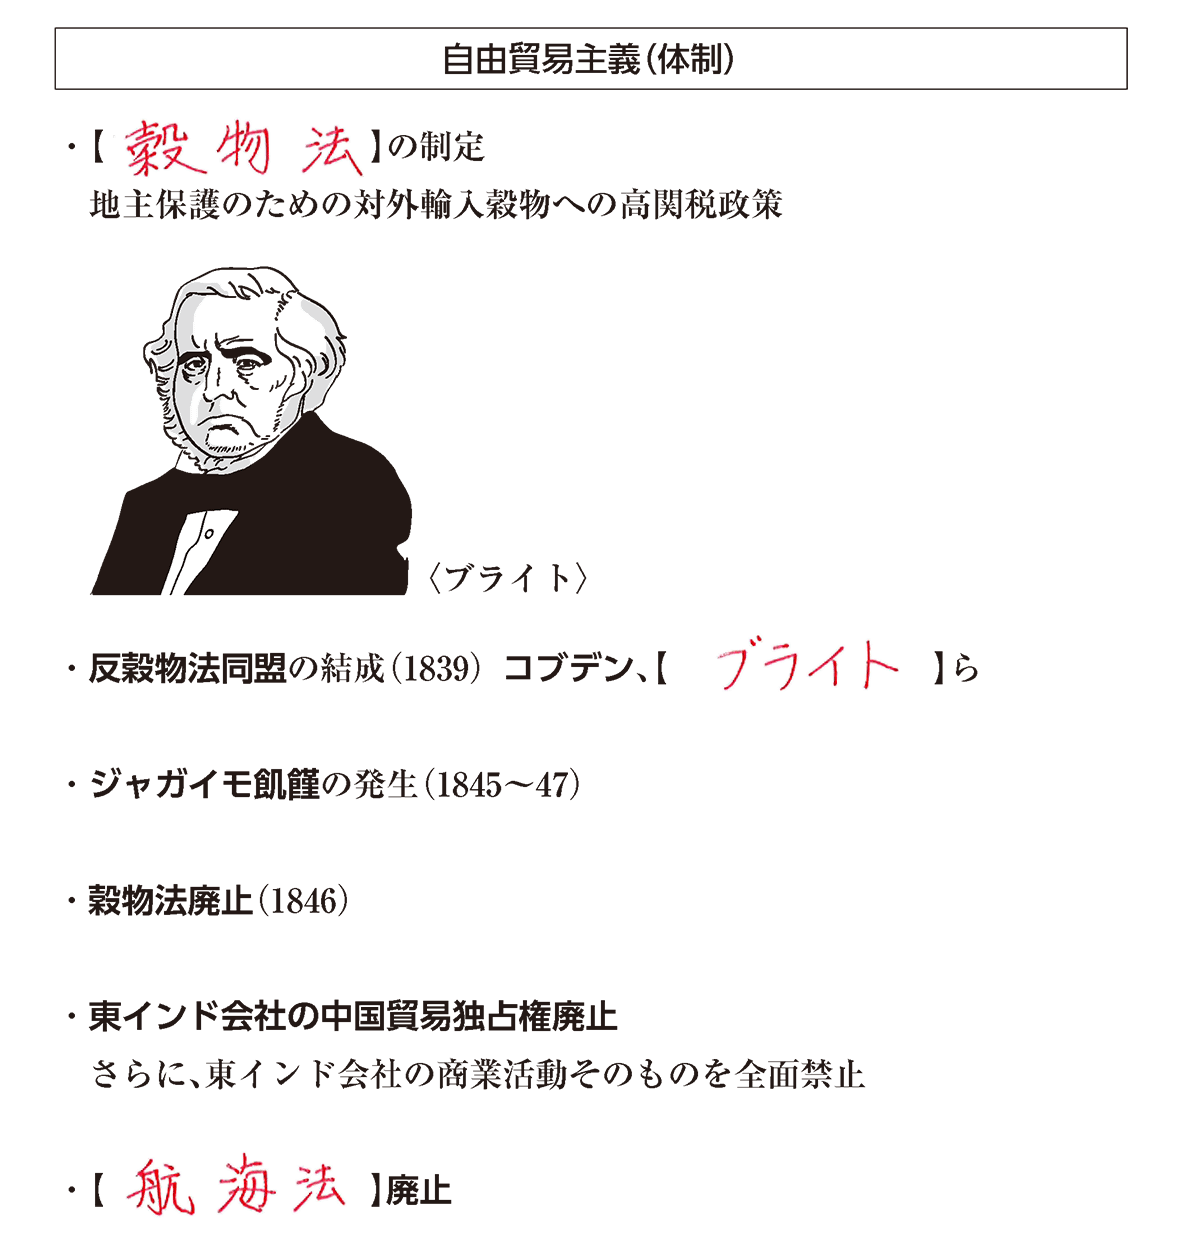 高校世界史 19世紀欧米諸国(1)1 ポイント3 答え全部